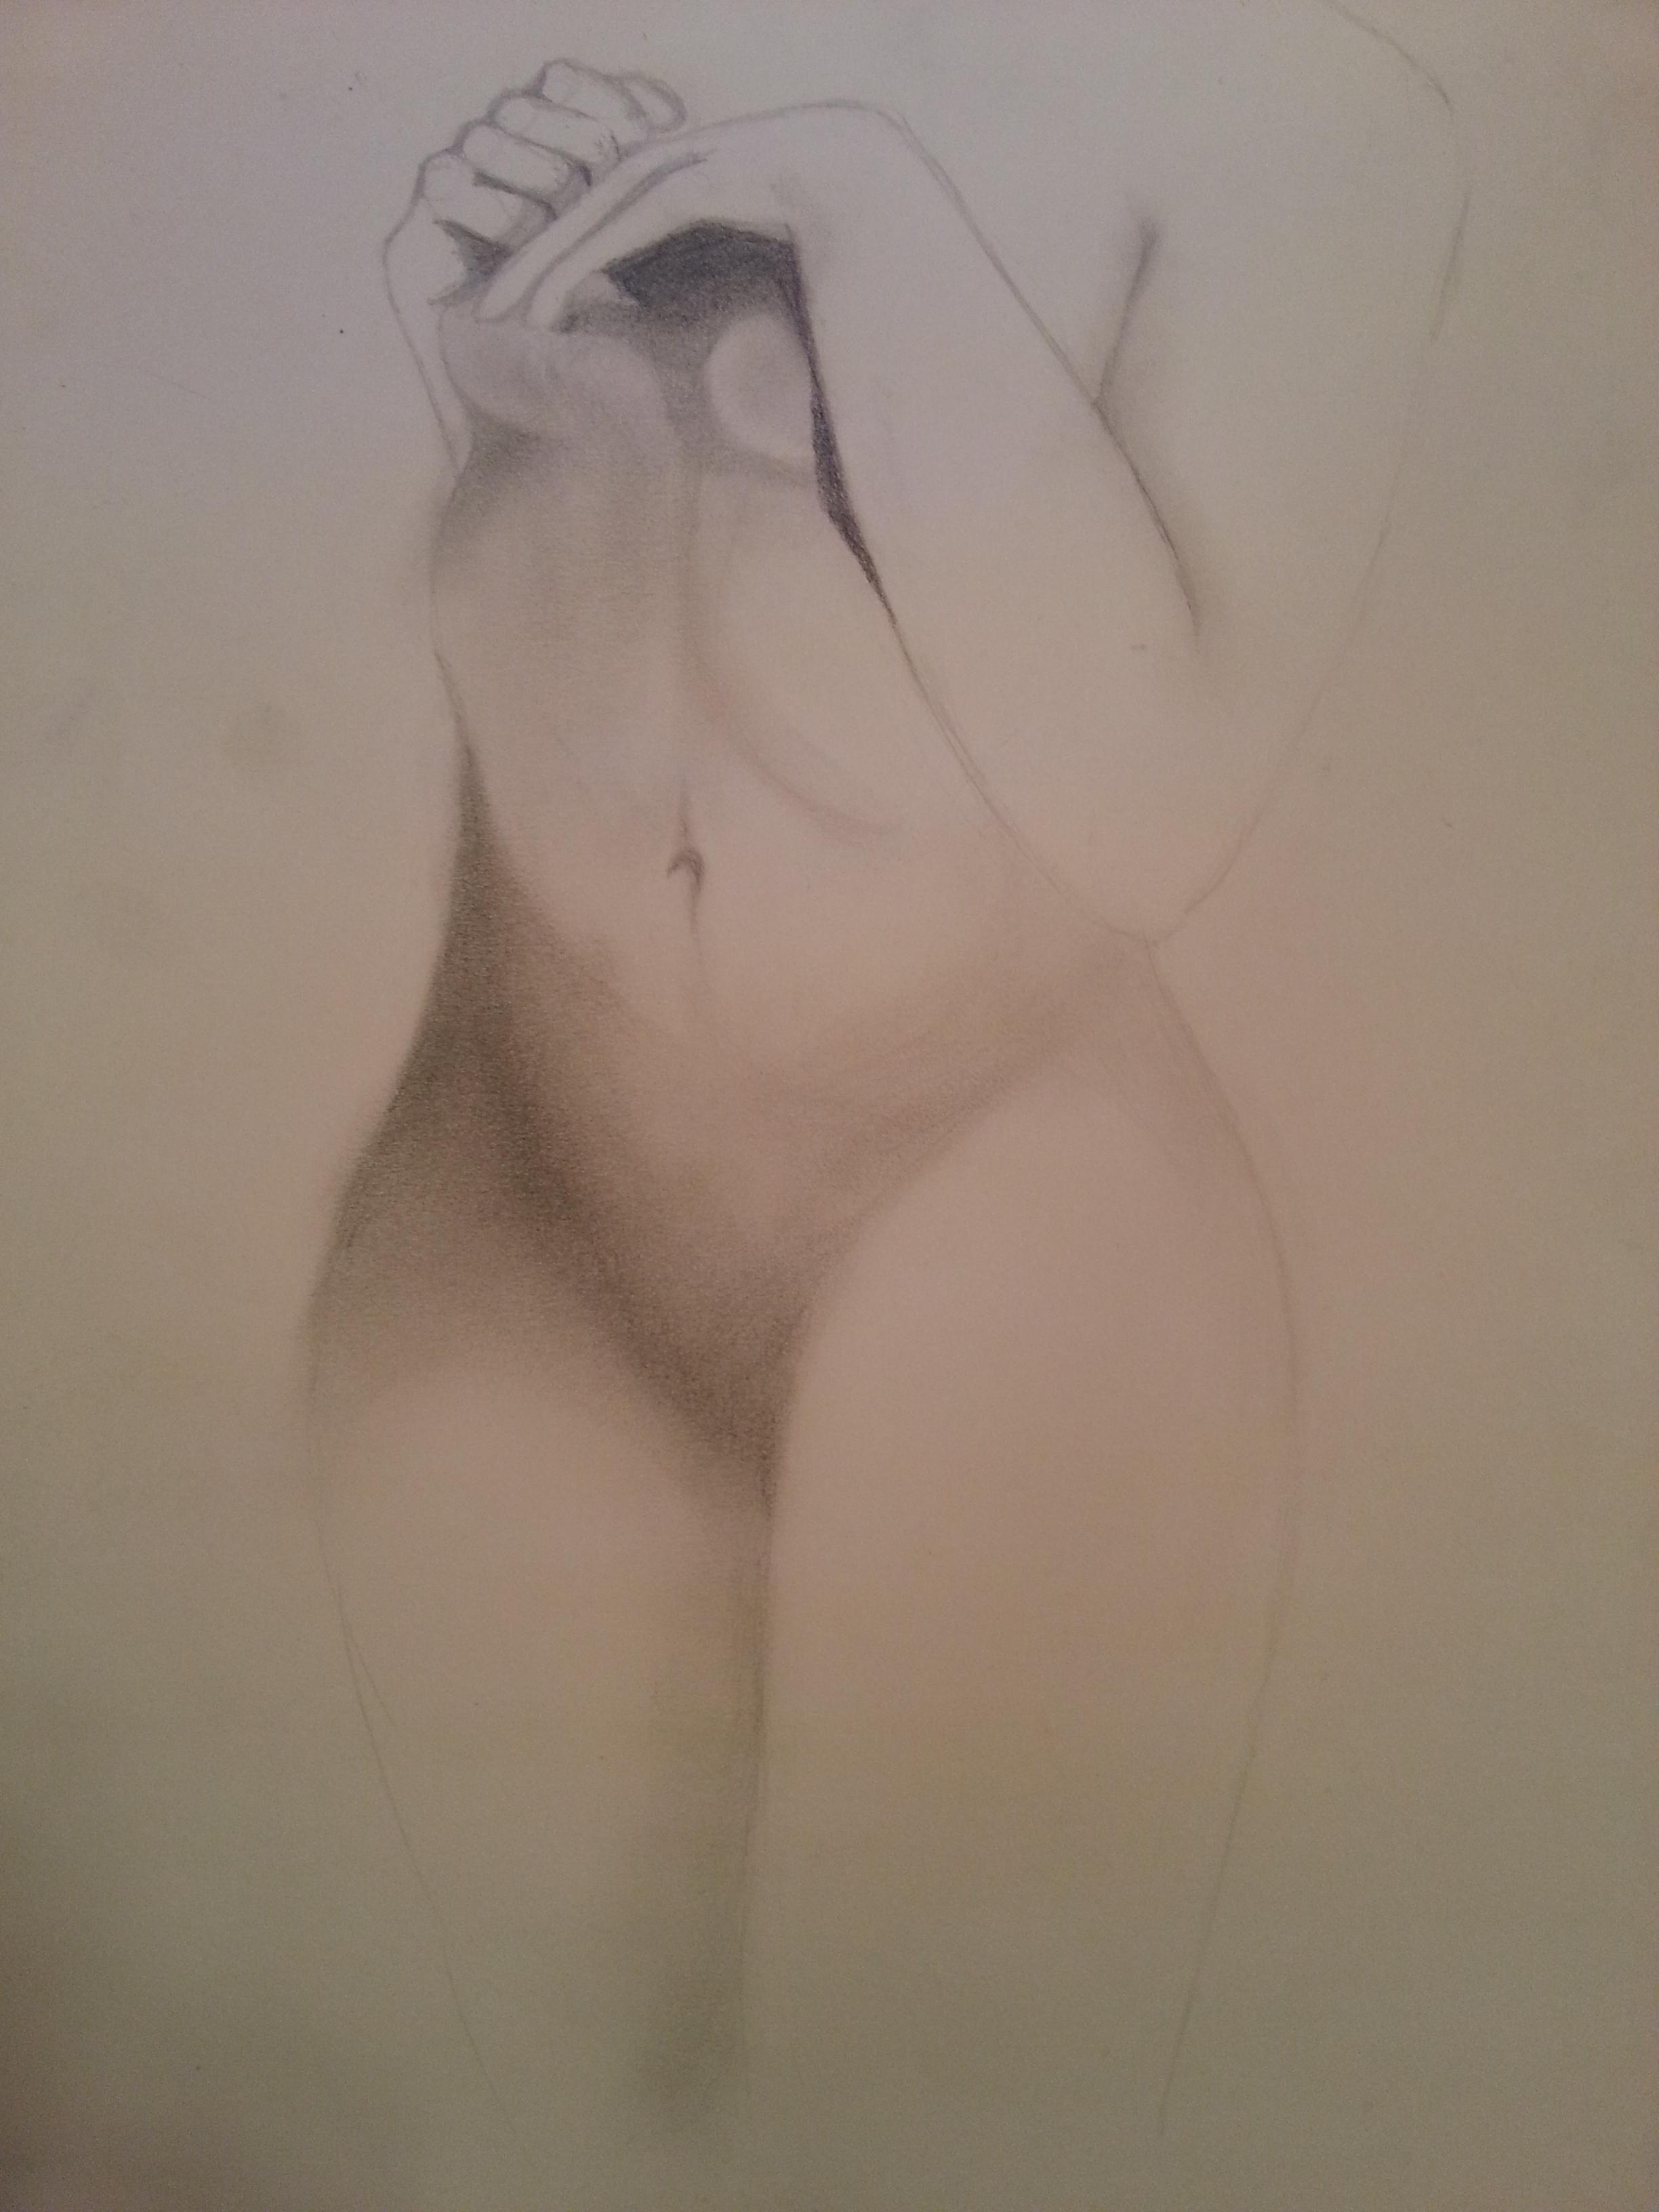 Tasteful Nudity